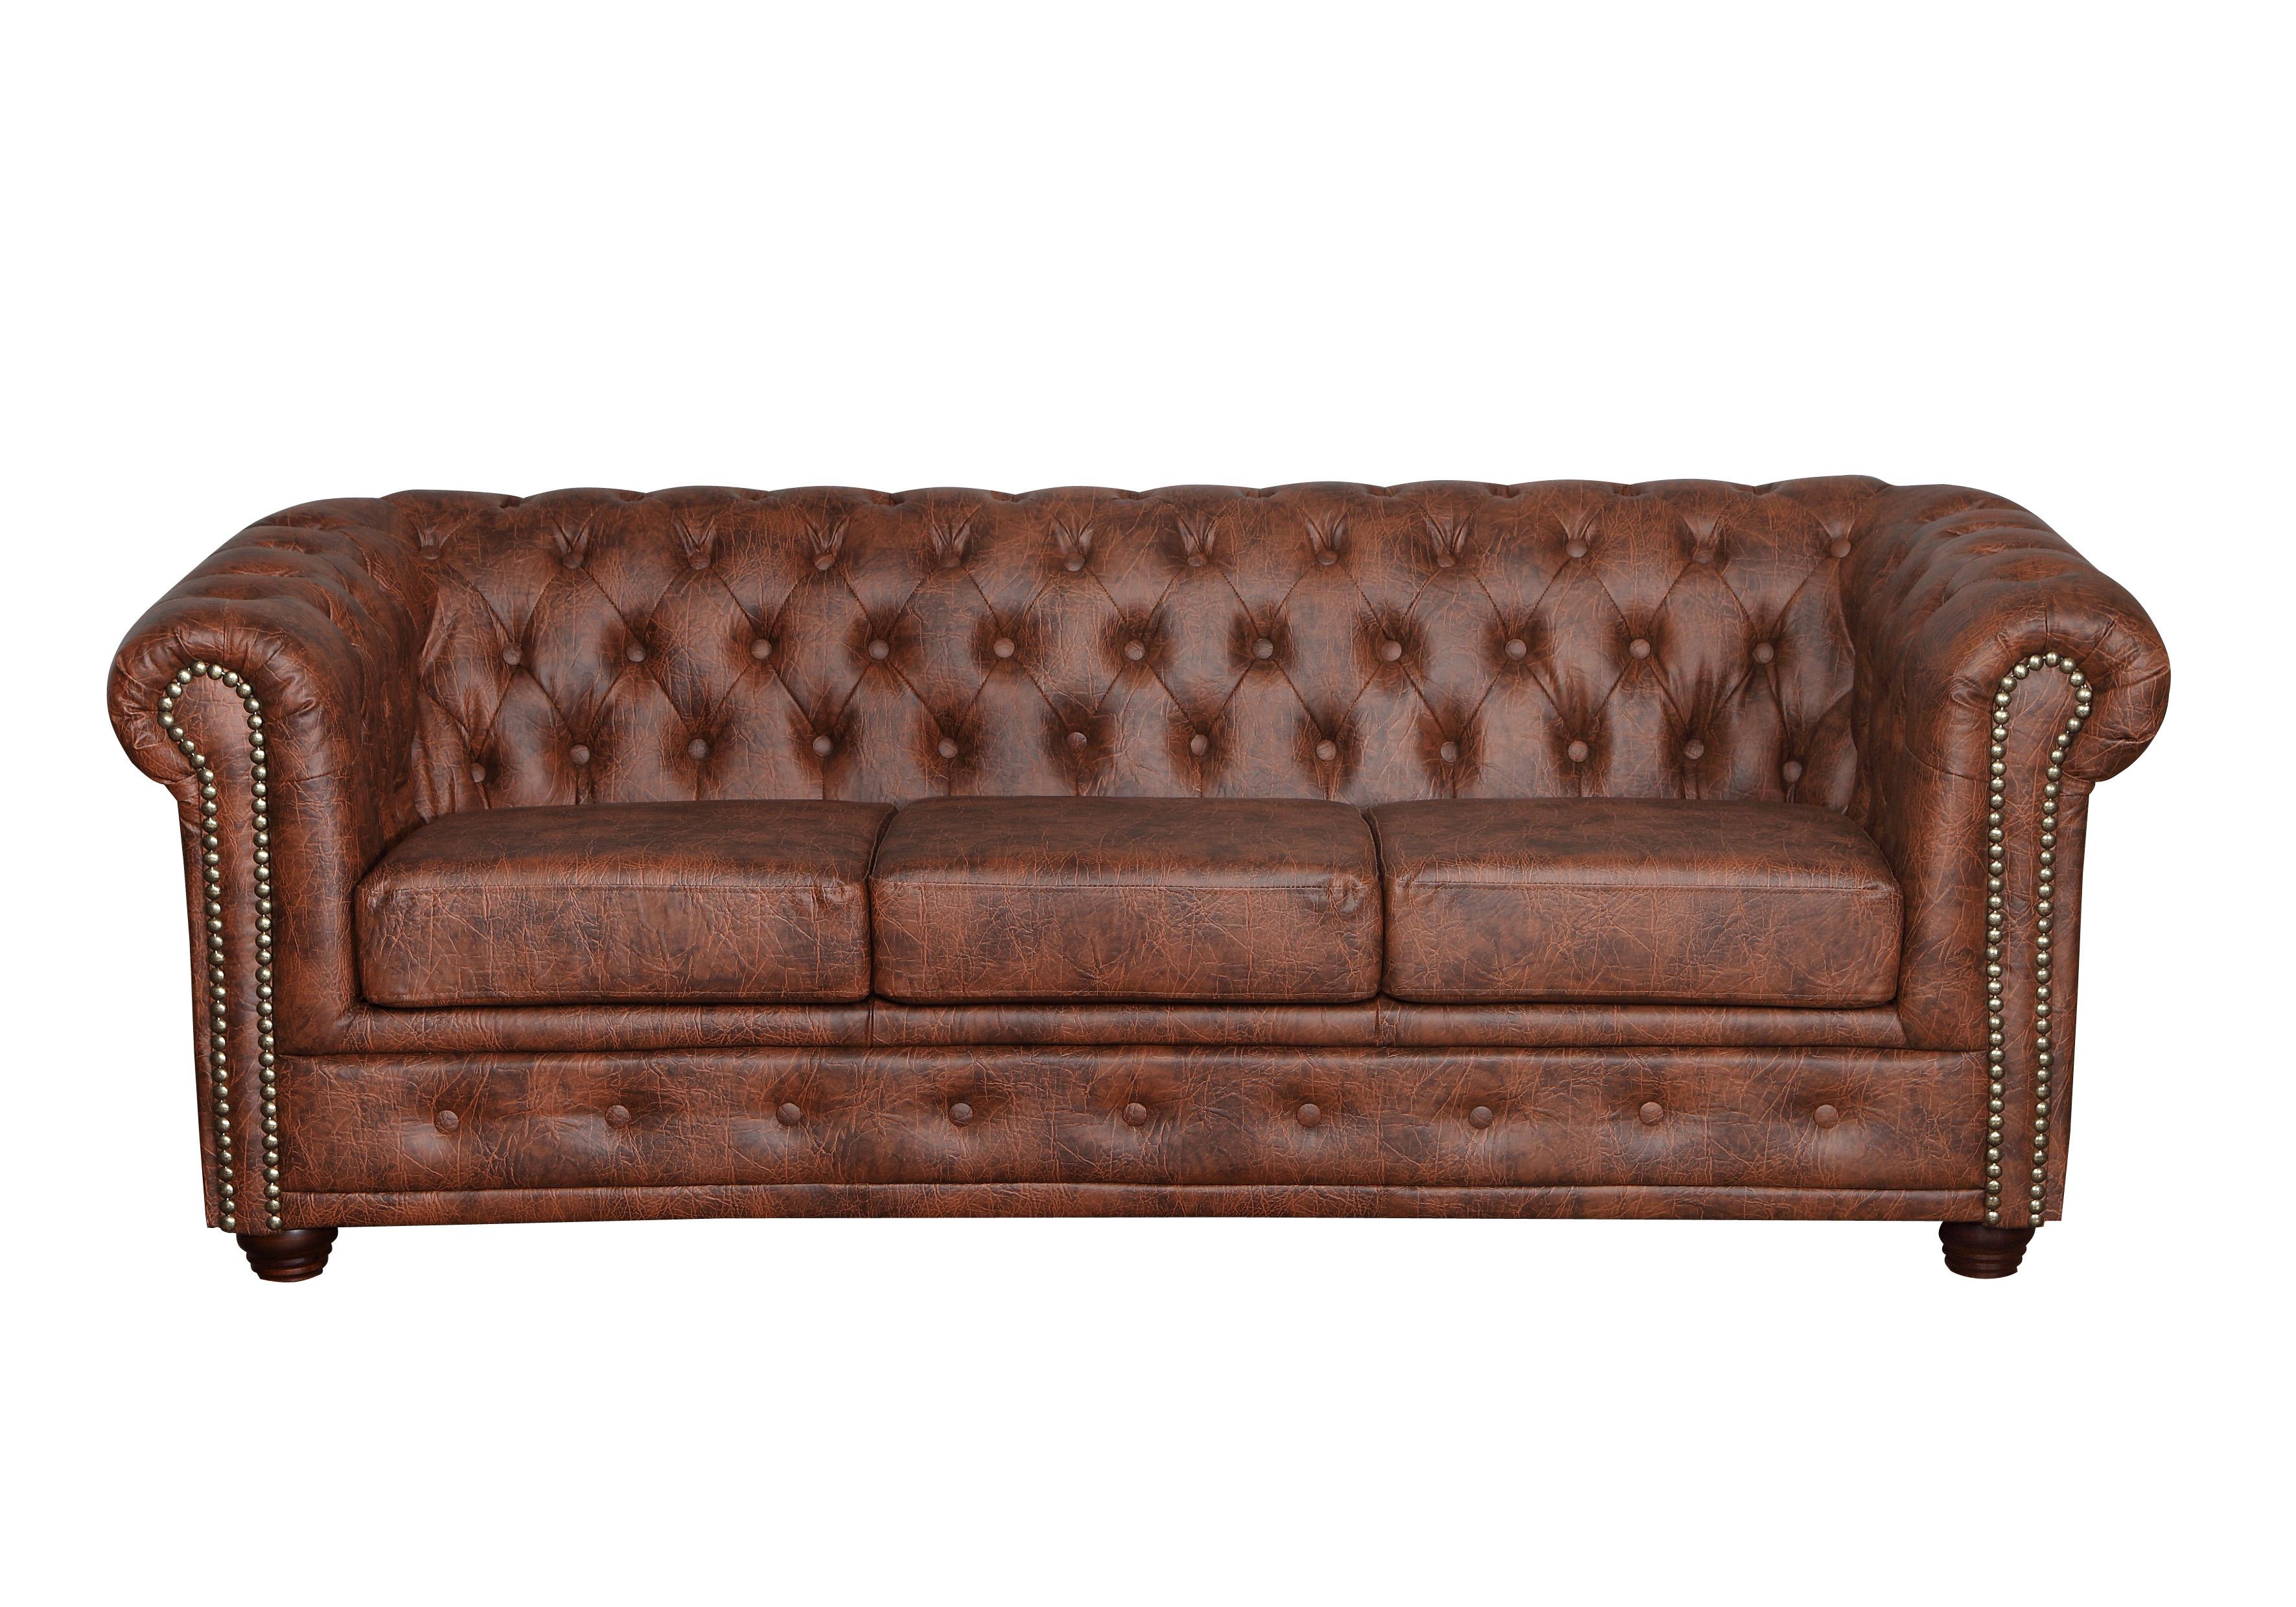 Chesterfield 3 2er Sitzer Sessel Hocker Bett Industrie Braun